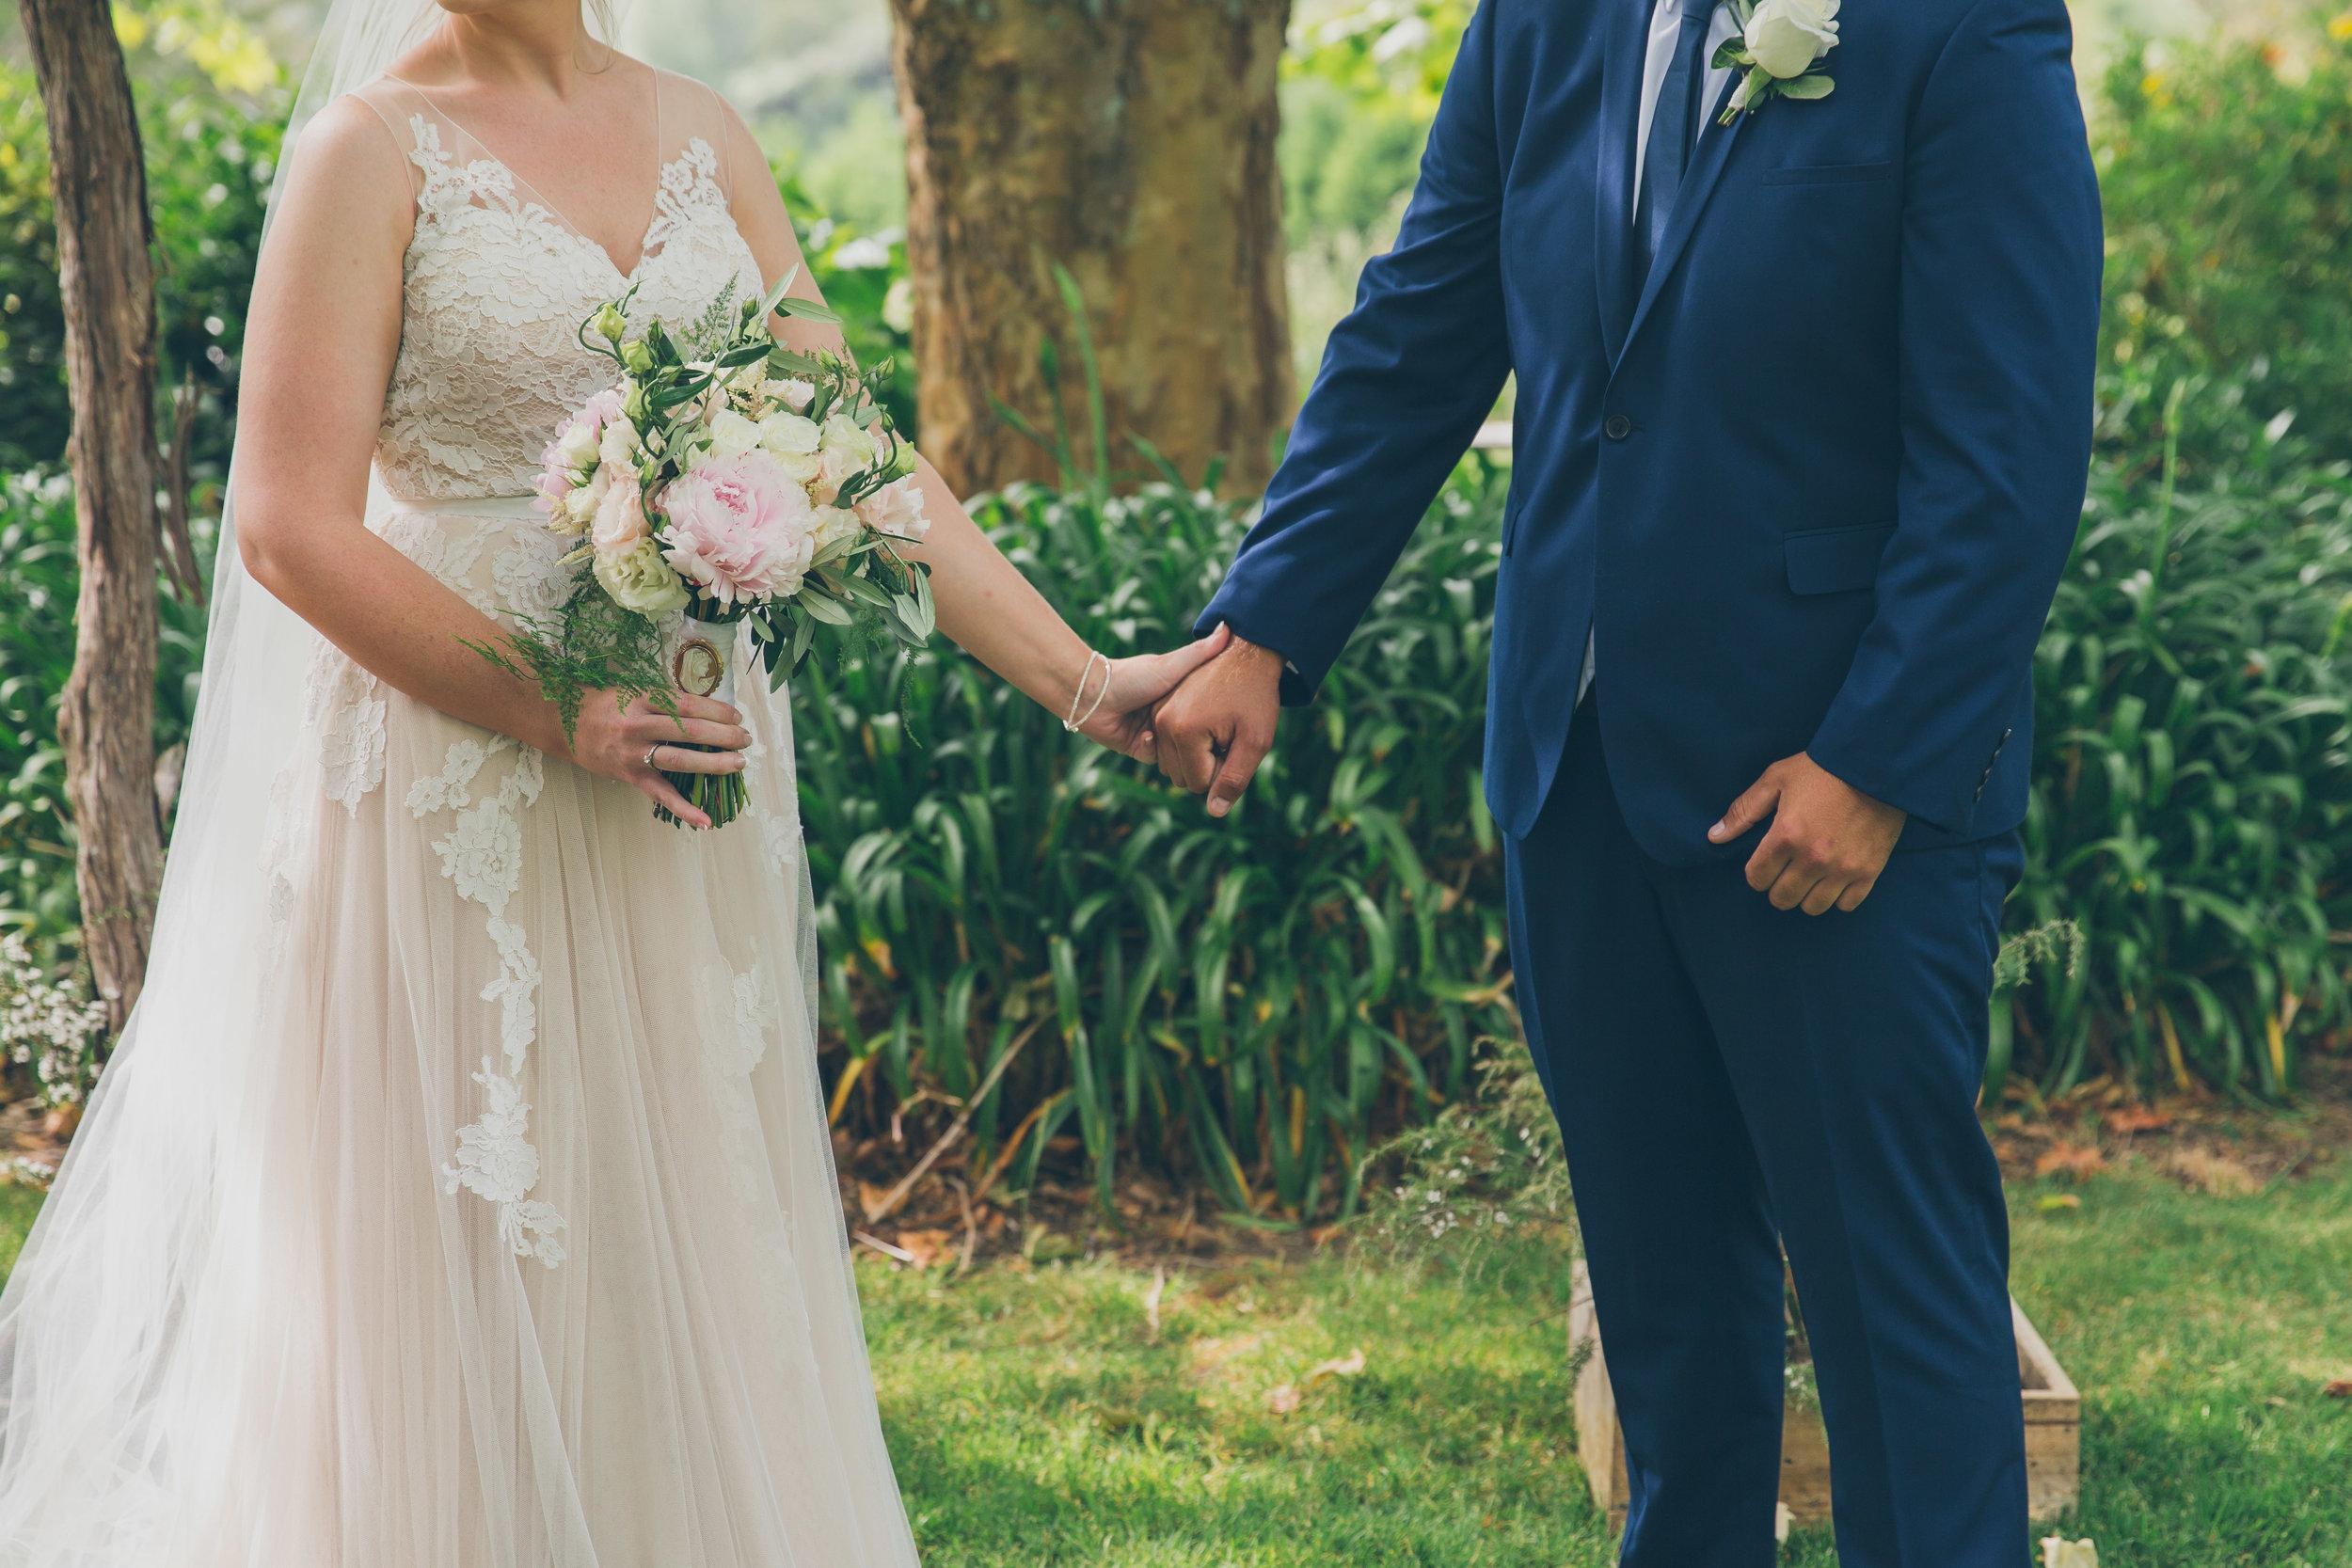 C & J - Wedding - Oh Joy! Photography - Tauranga, New Zealand-2.jpg